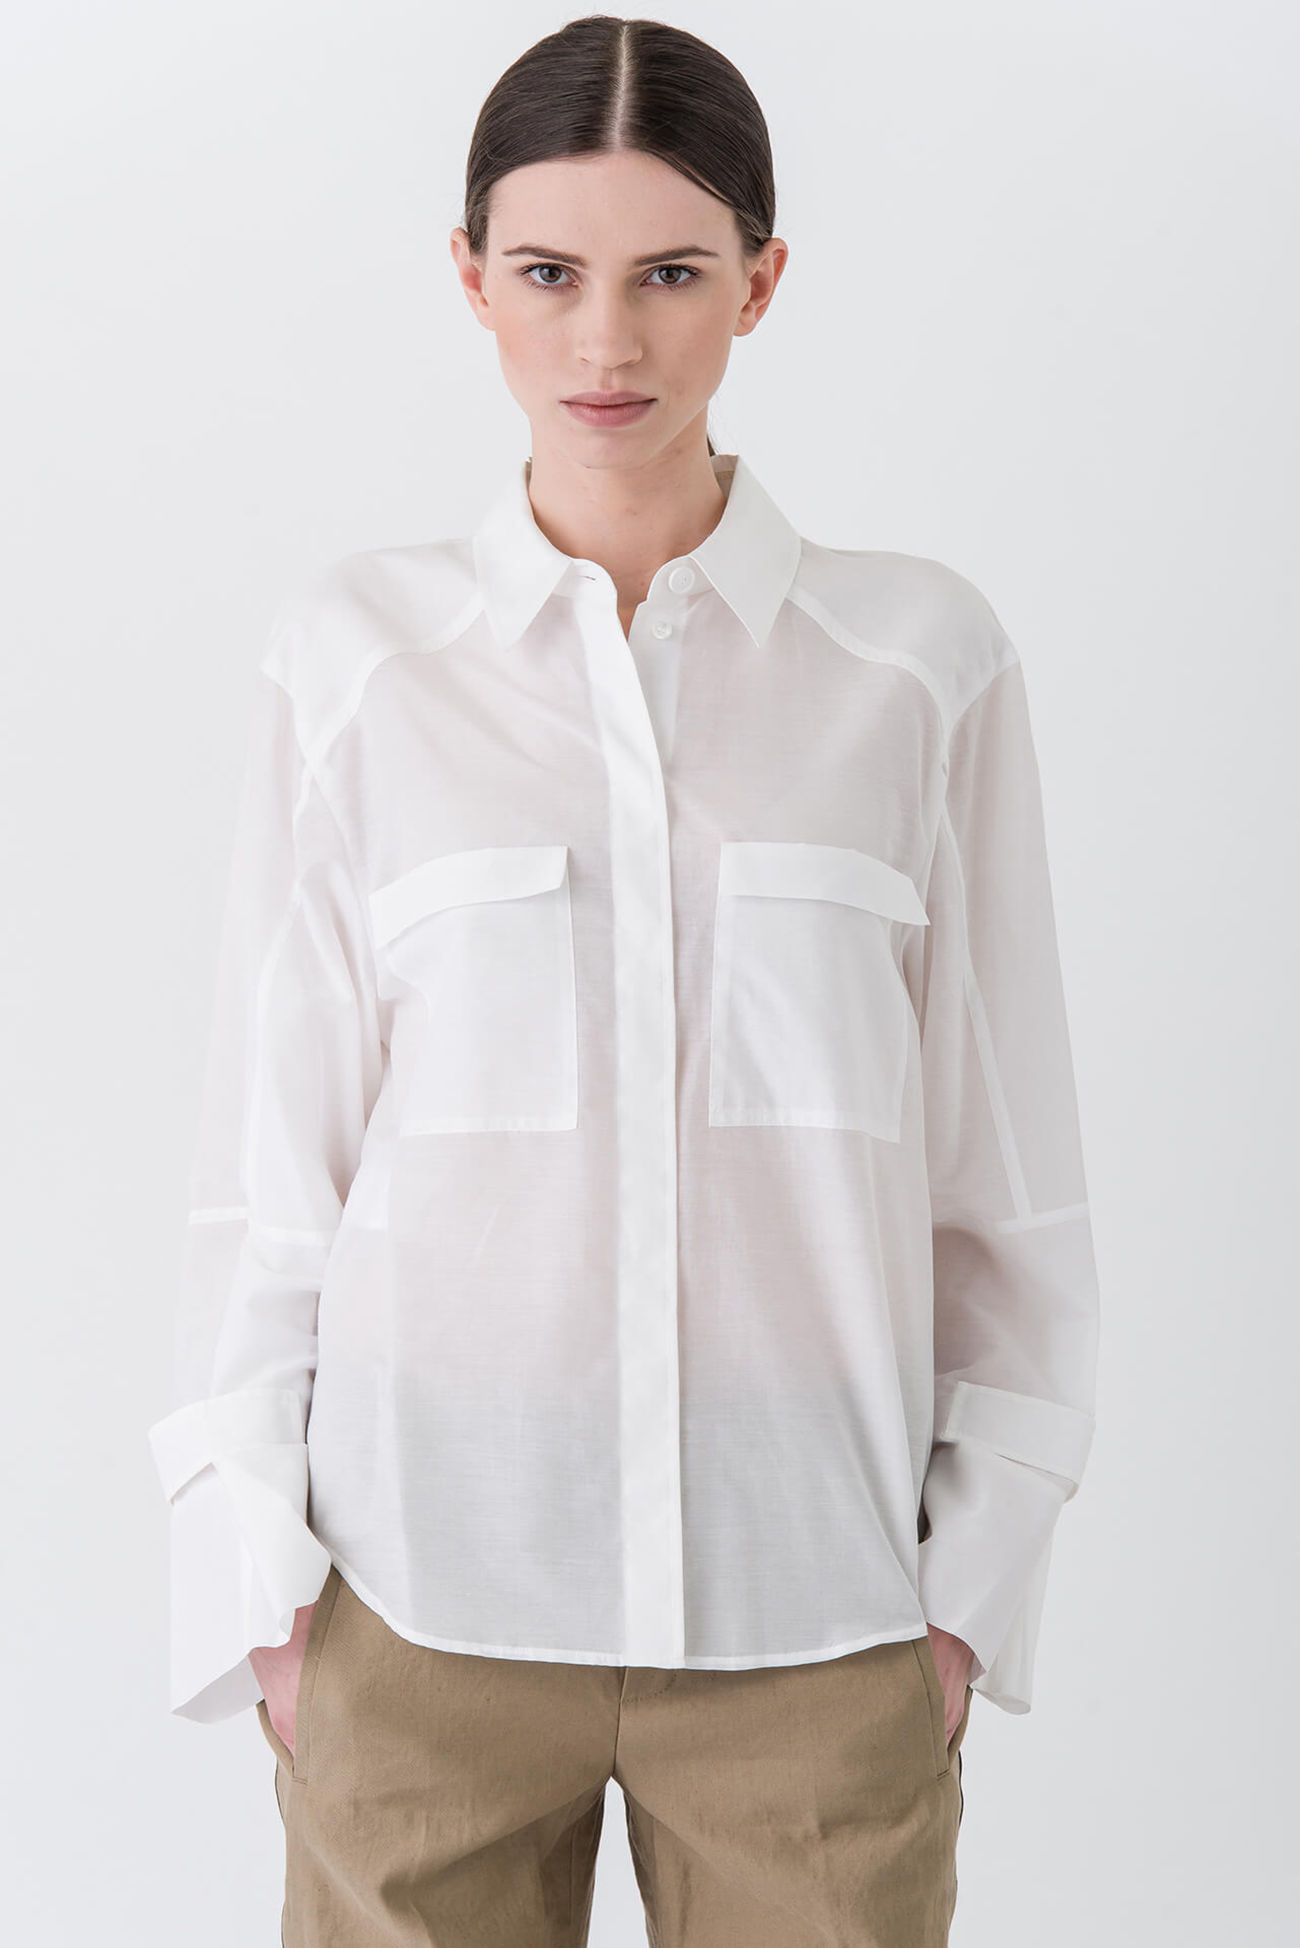 Coole Oversized-Bluse mit spannenden Details